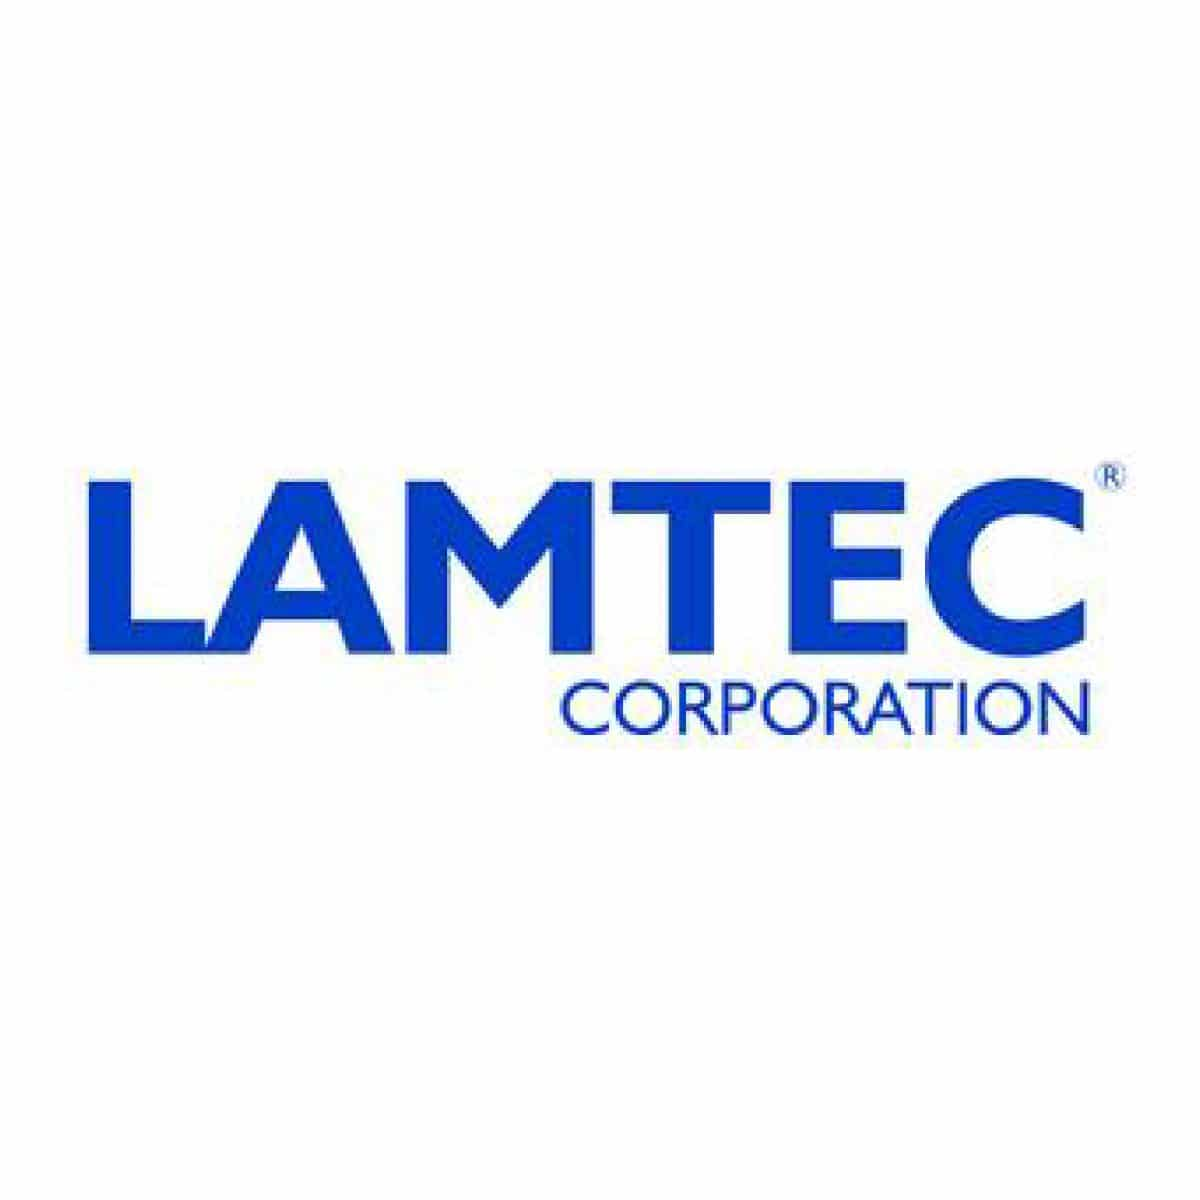 Lamtec Corporation